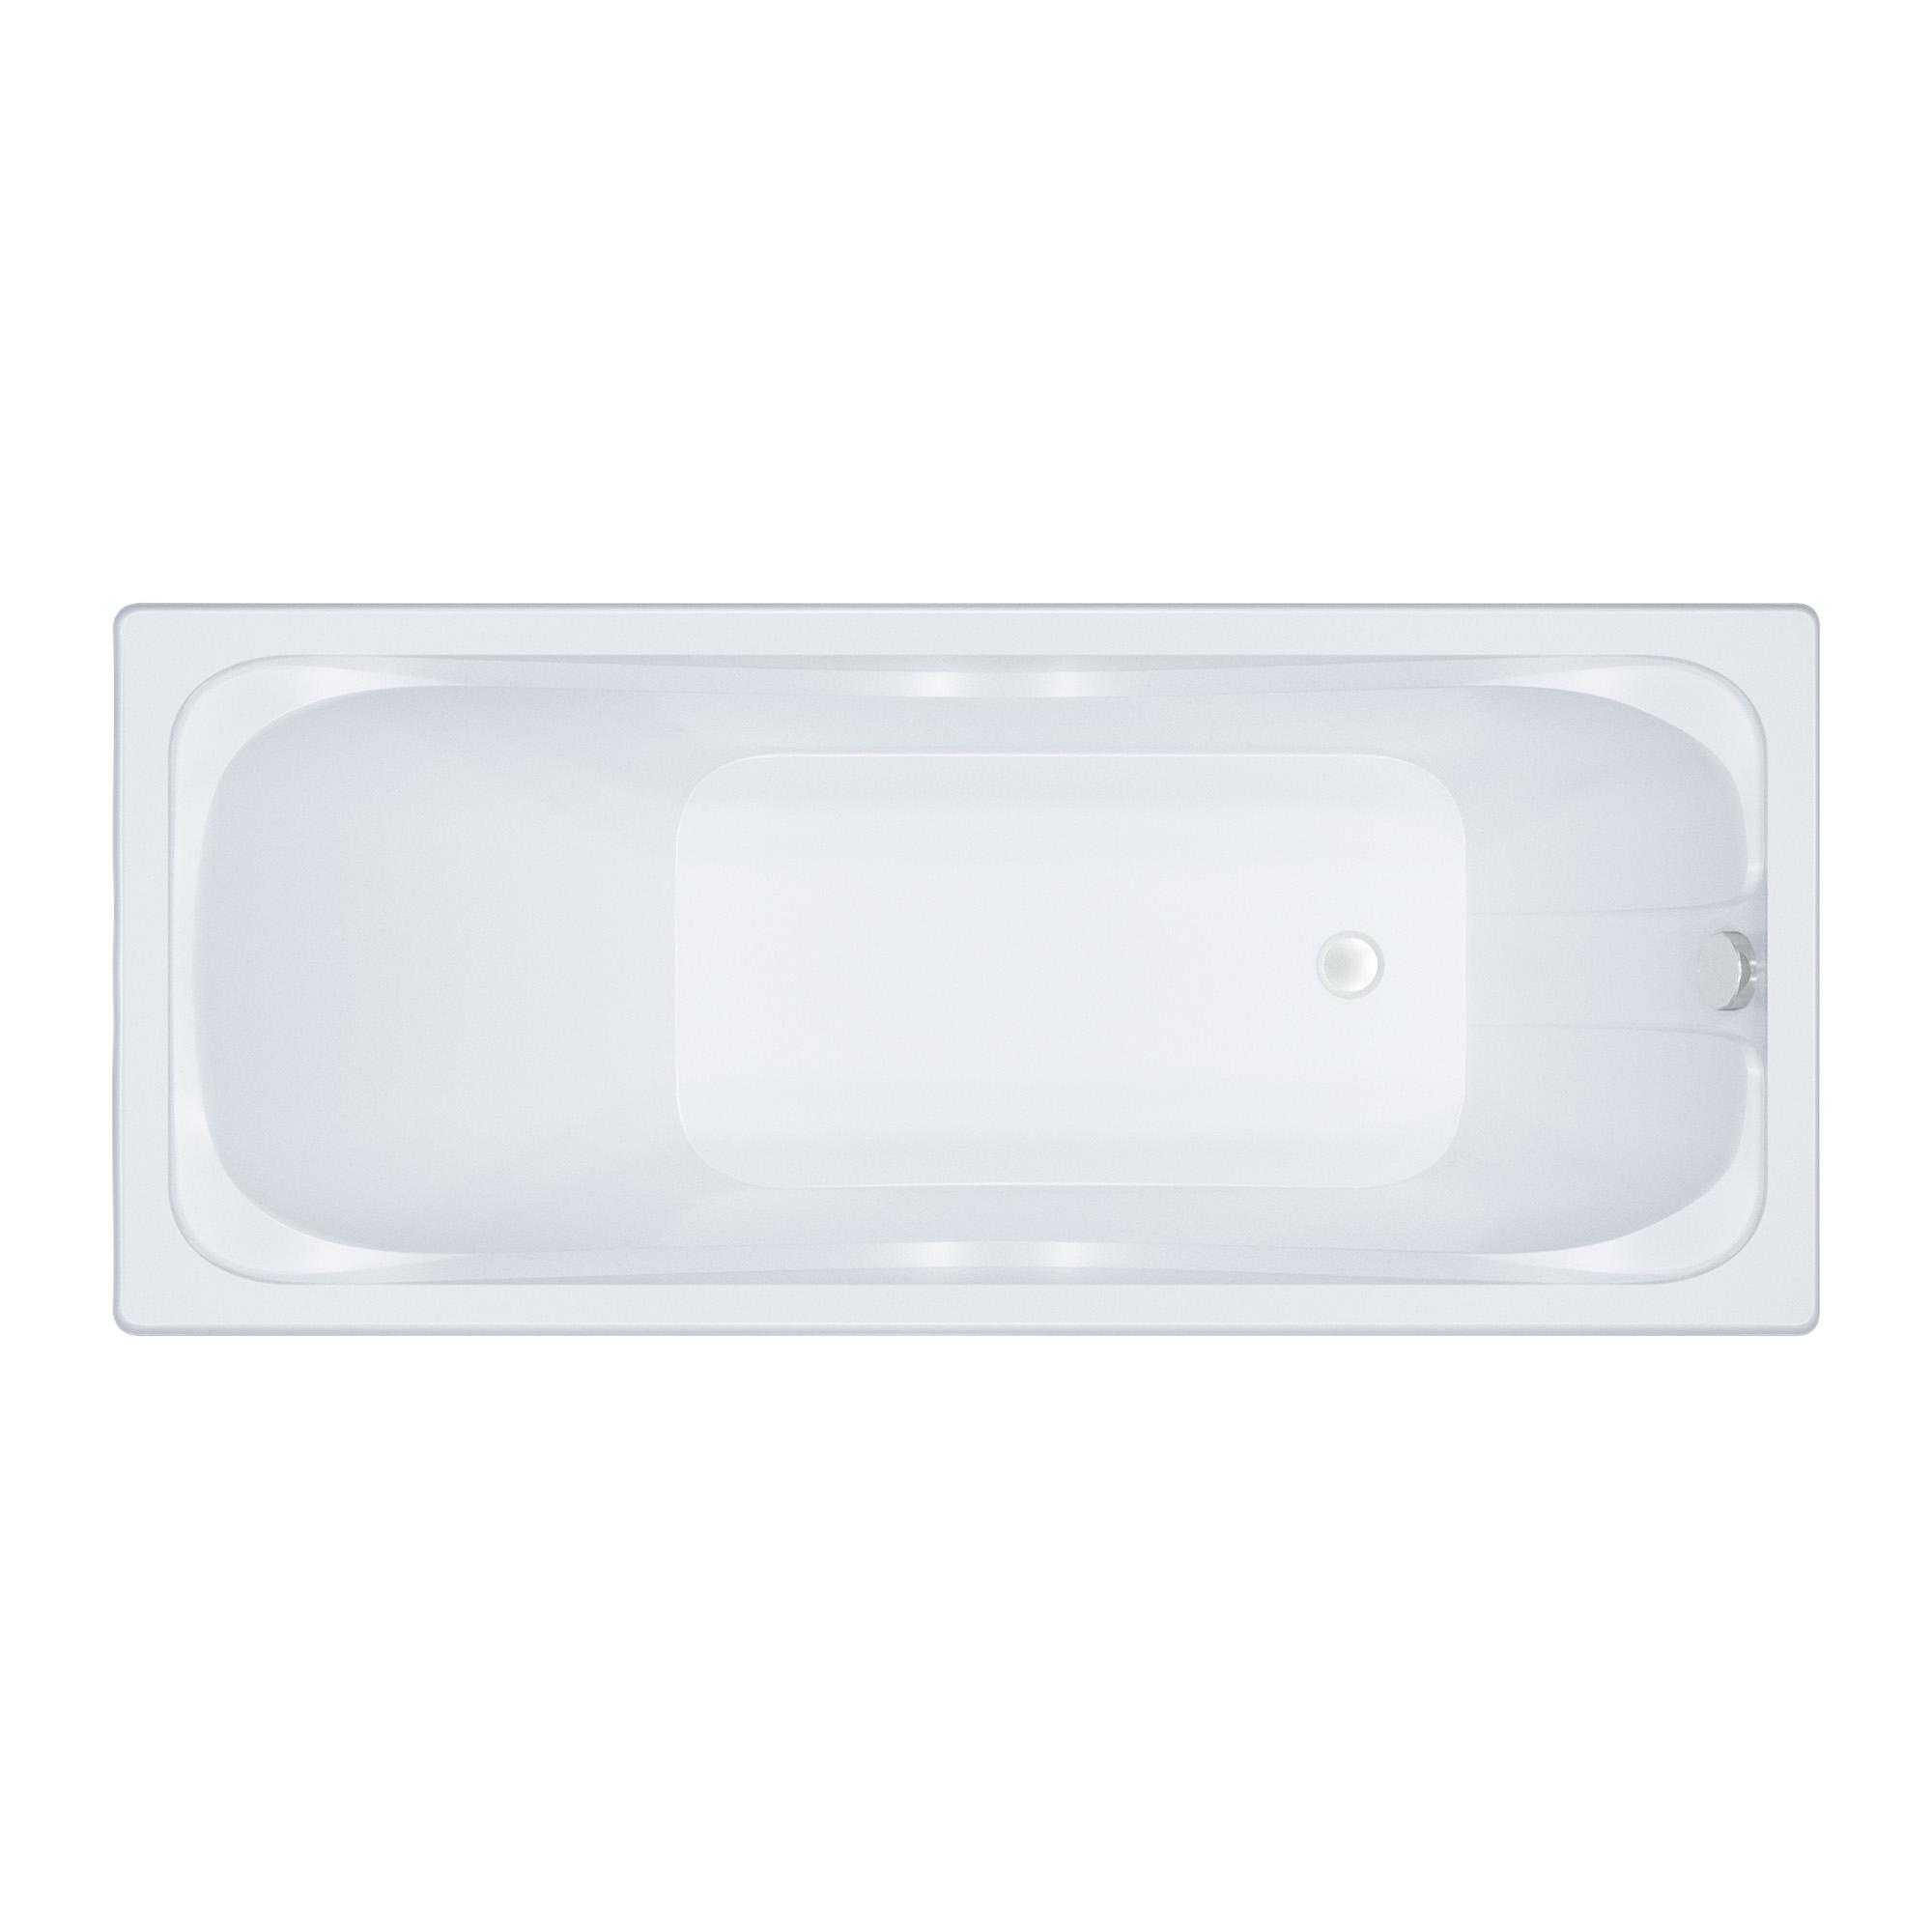 Акриловая ванна Тритон Стандарт 130 экран для ванны triton стандарт 120